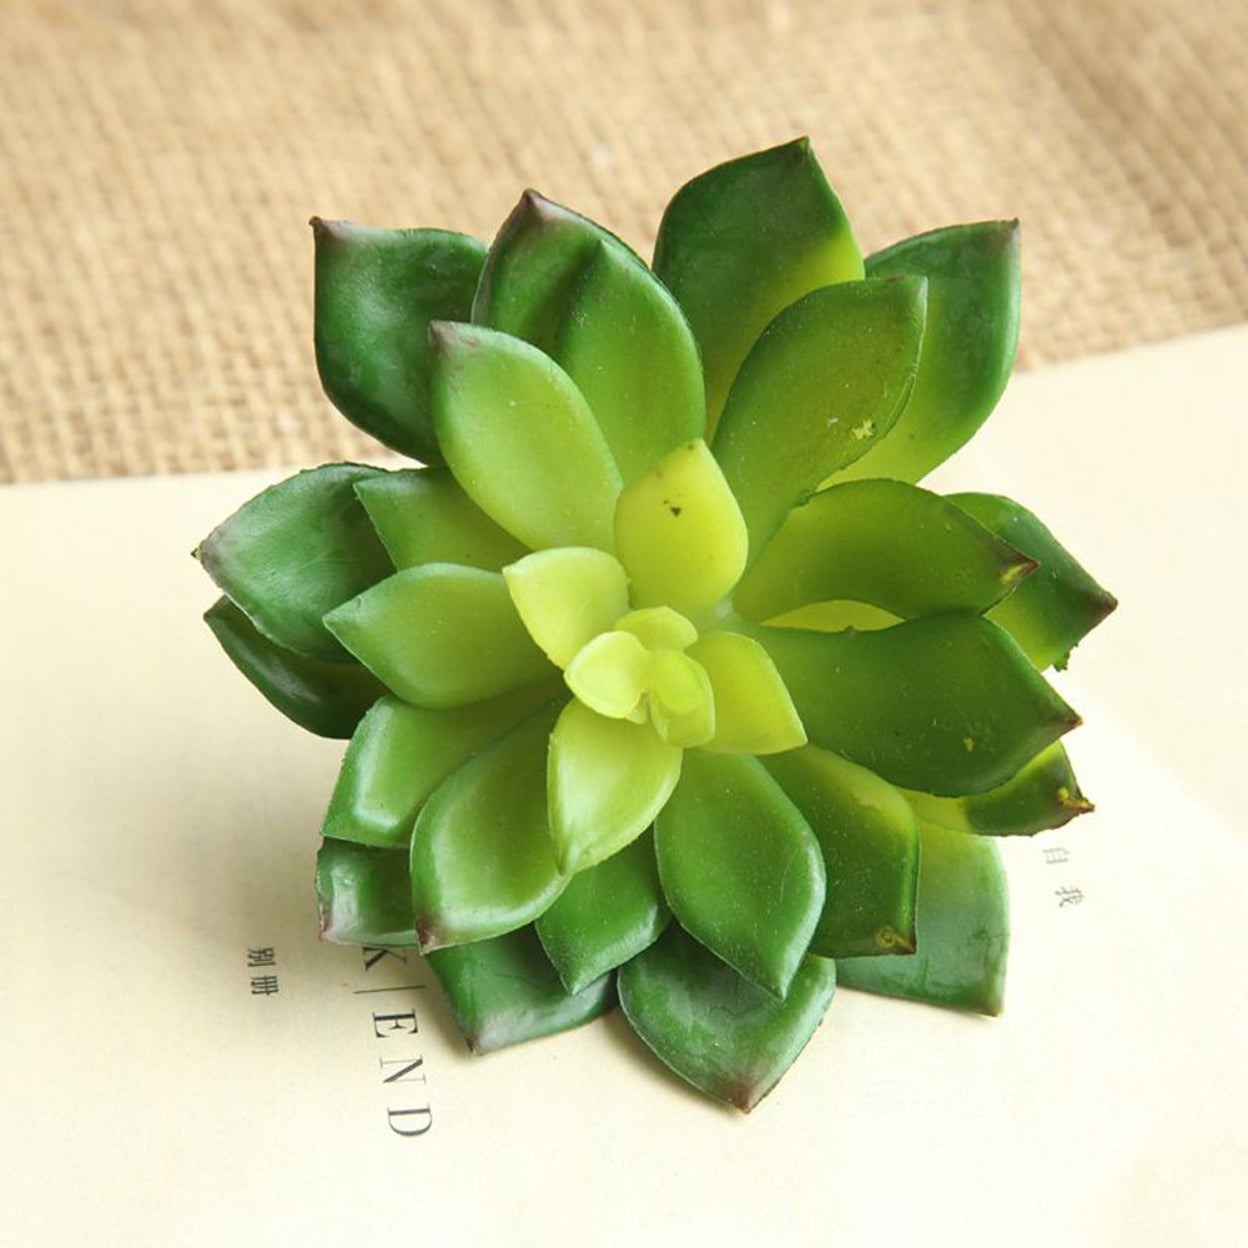 Artificial Succulents Plant Garden Miniature Fake Cactus DIY Home Floral Decor